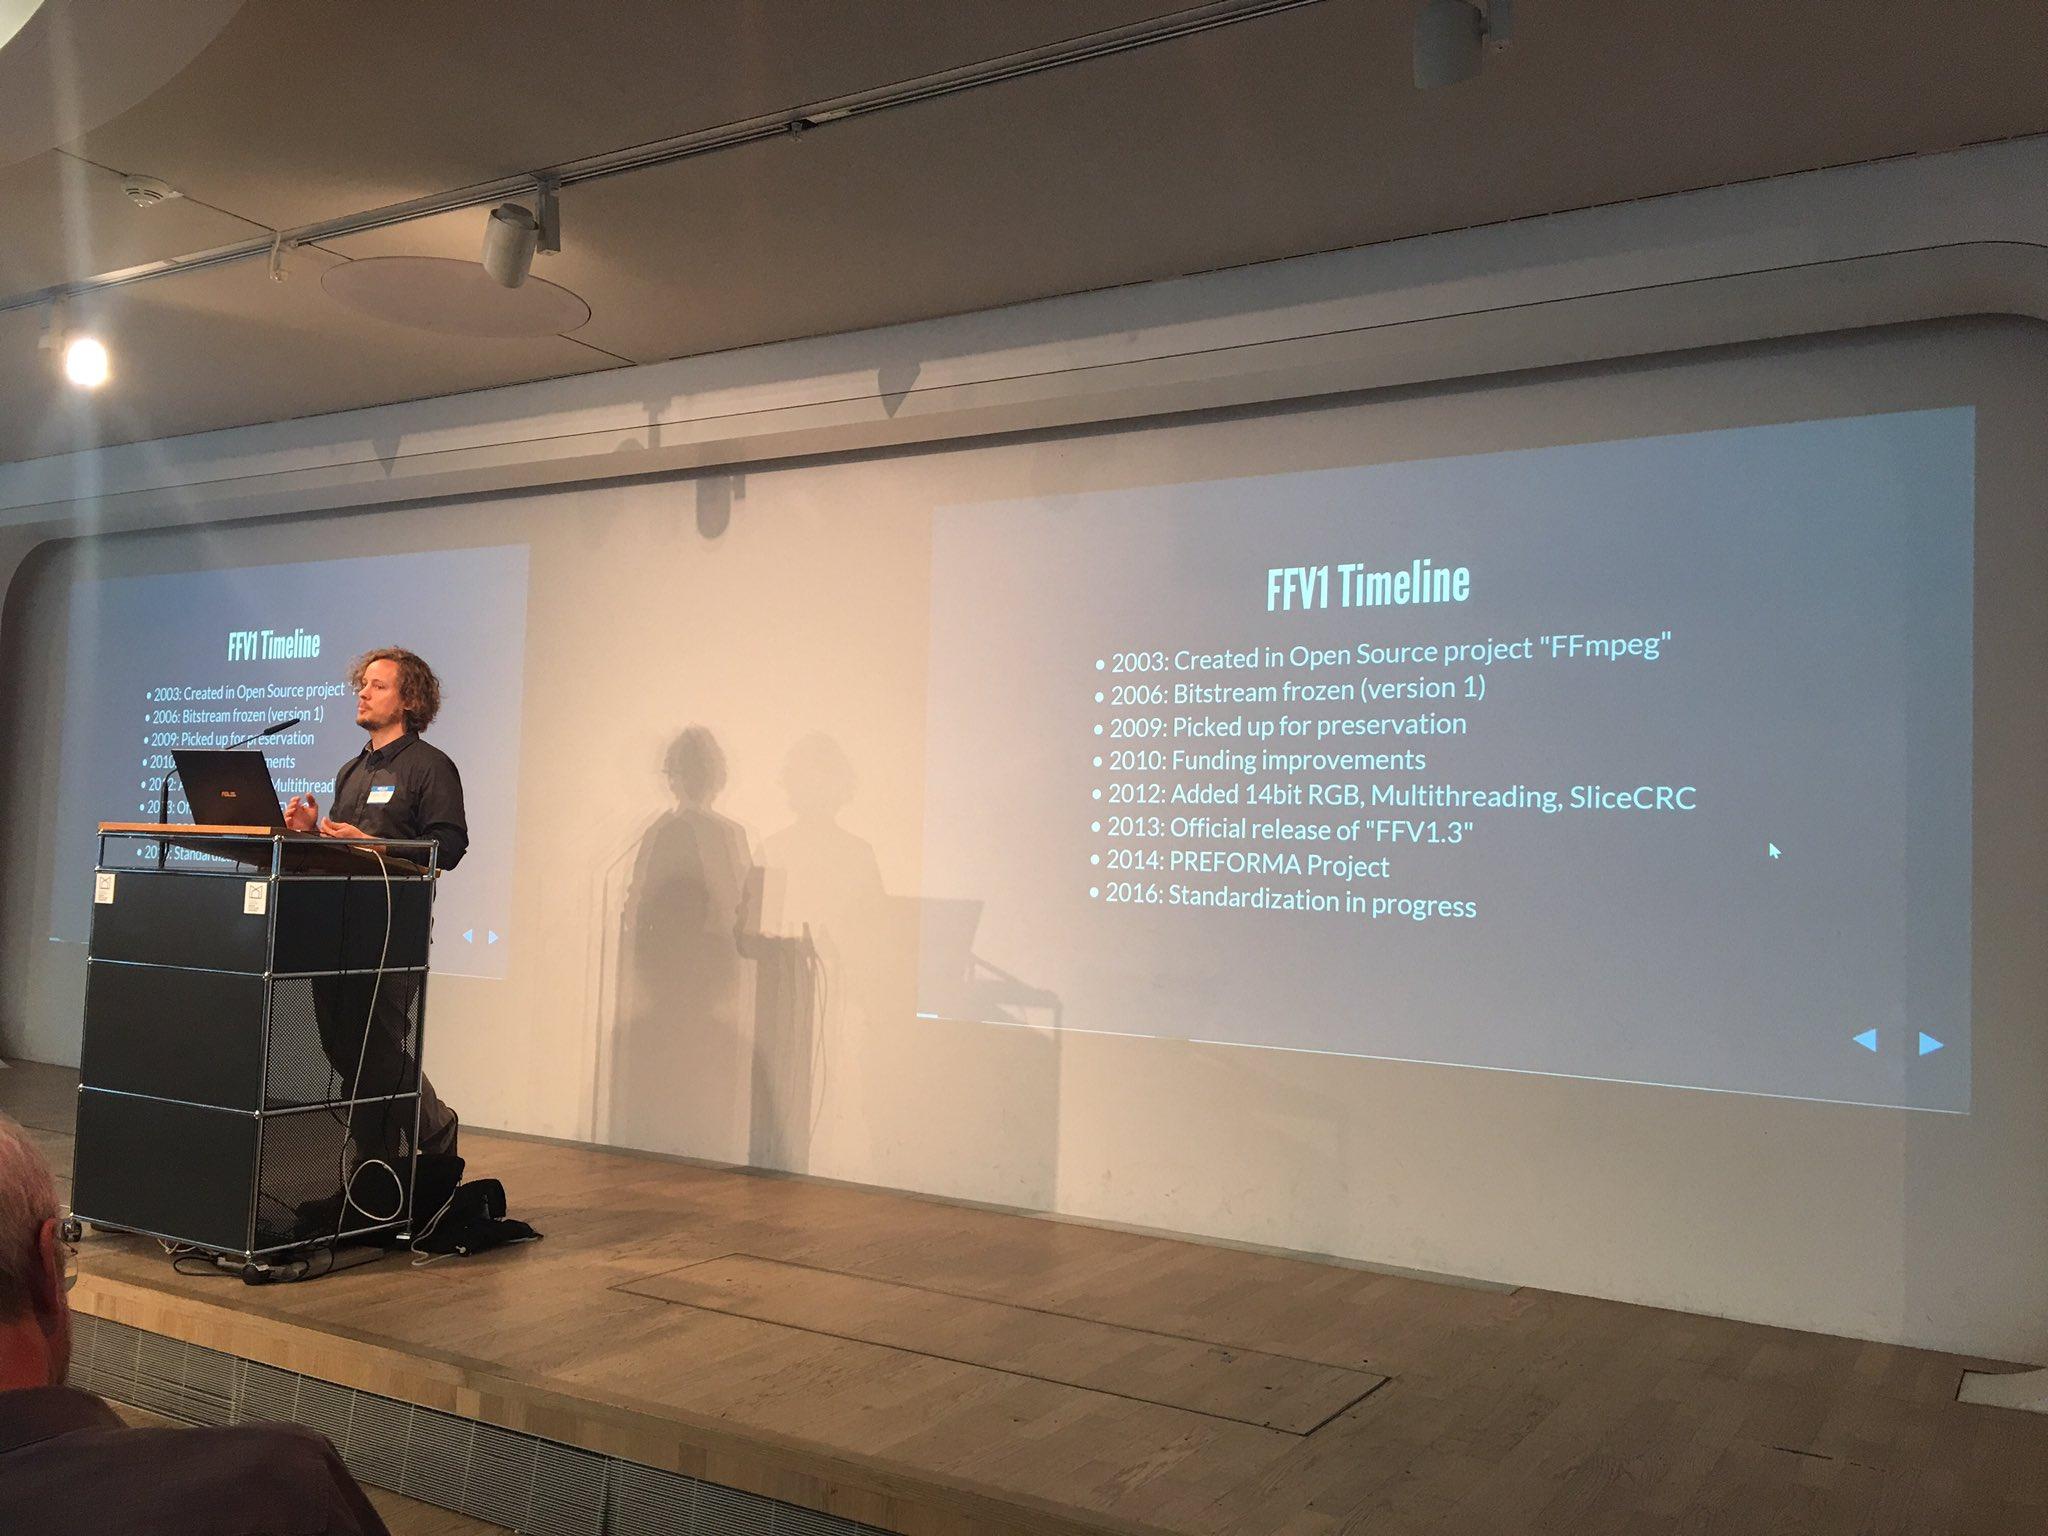 .@pjotrek_b gives the objective timeline of FFV1 development. Next comes the unobjective timeline. #notimetowait https://t.co/FCdh4jwKsV